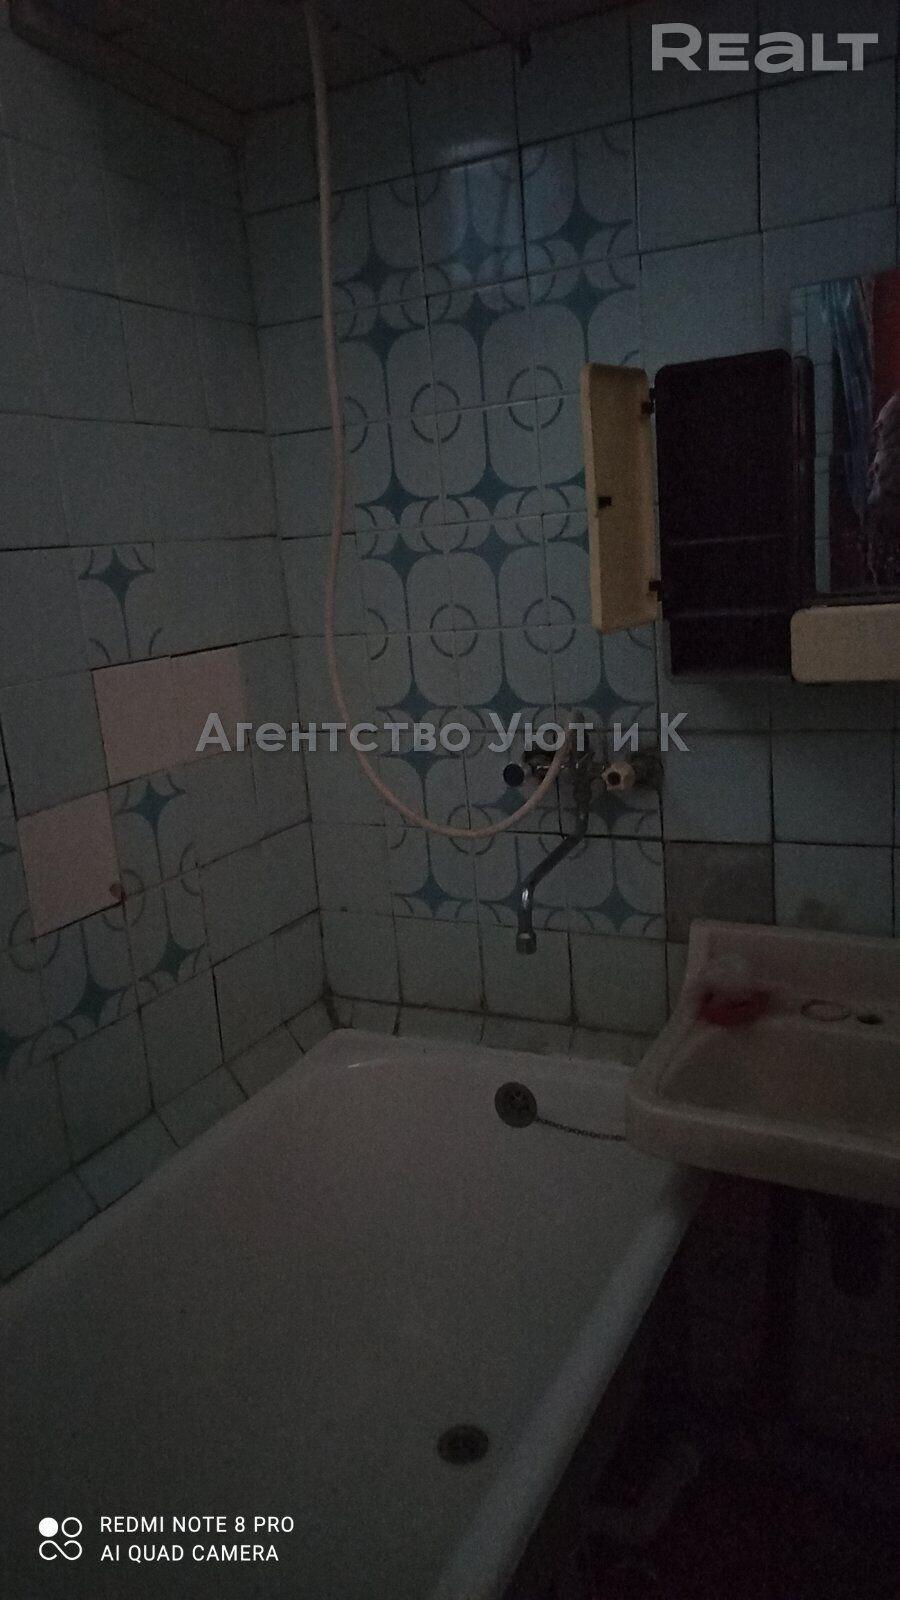 Продается комната в 2-х комнатной квартире, Витебск - фото №3